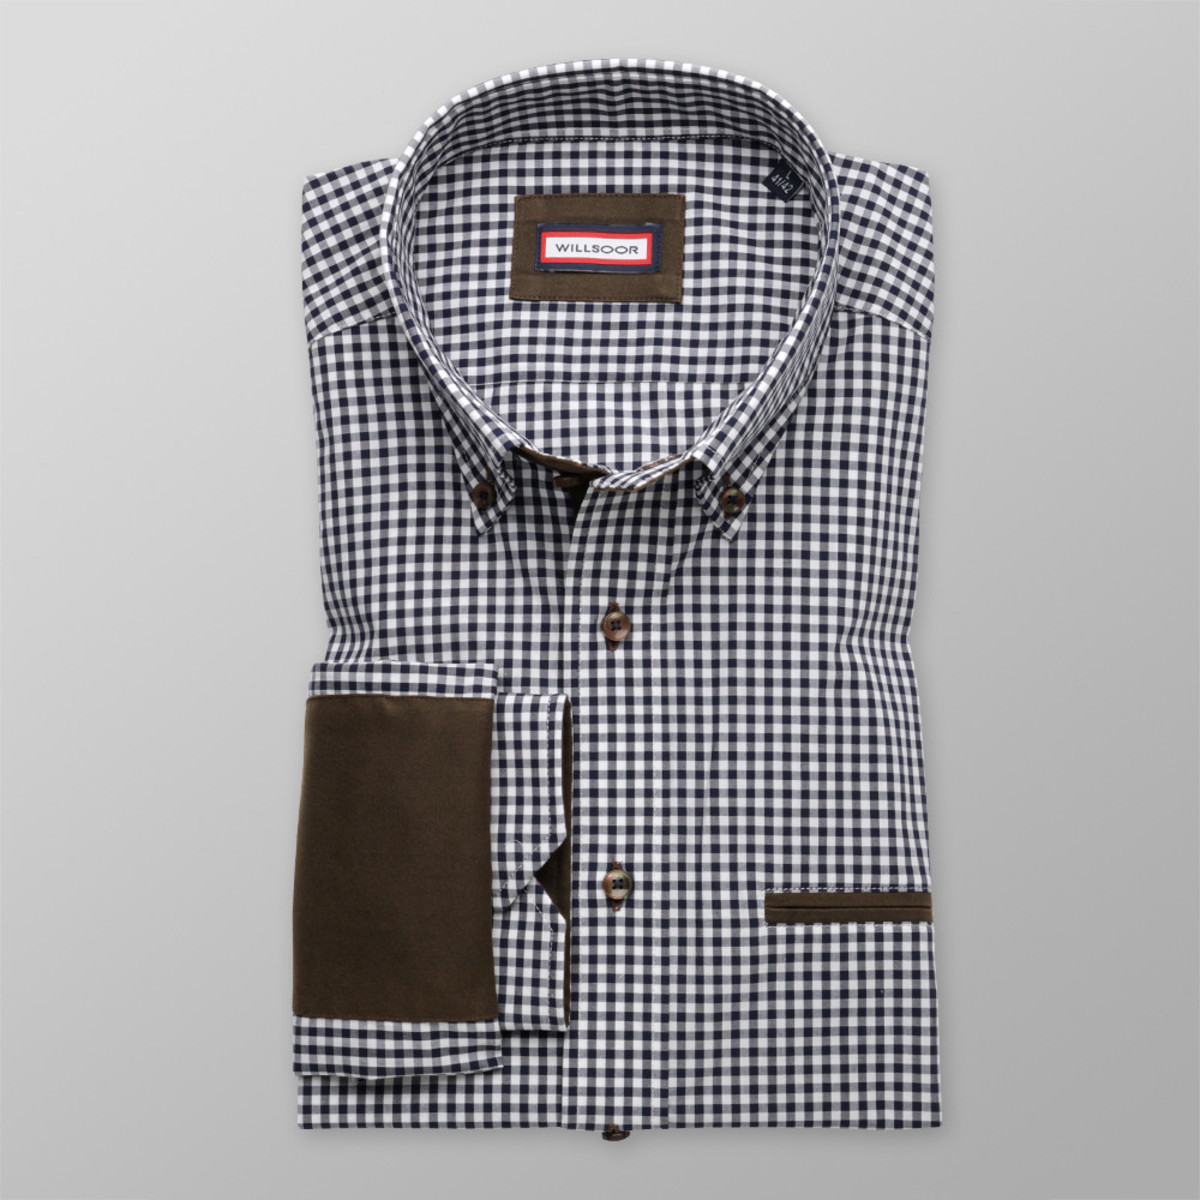 Košeľa Classic (výška 188-194) 9076 188-194 / XL (43/44)